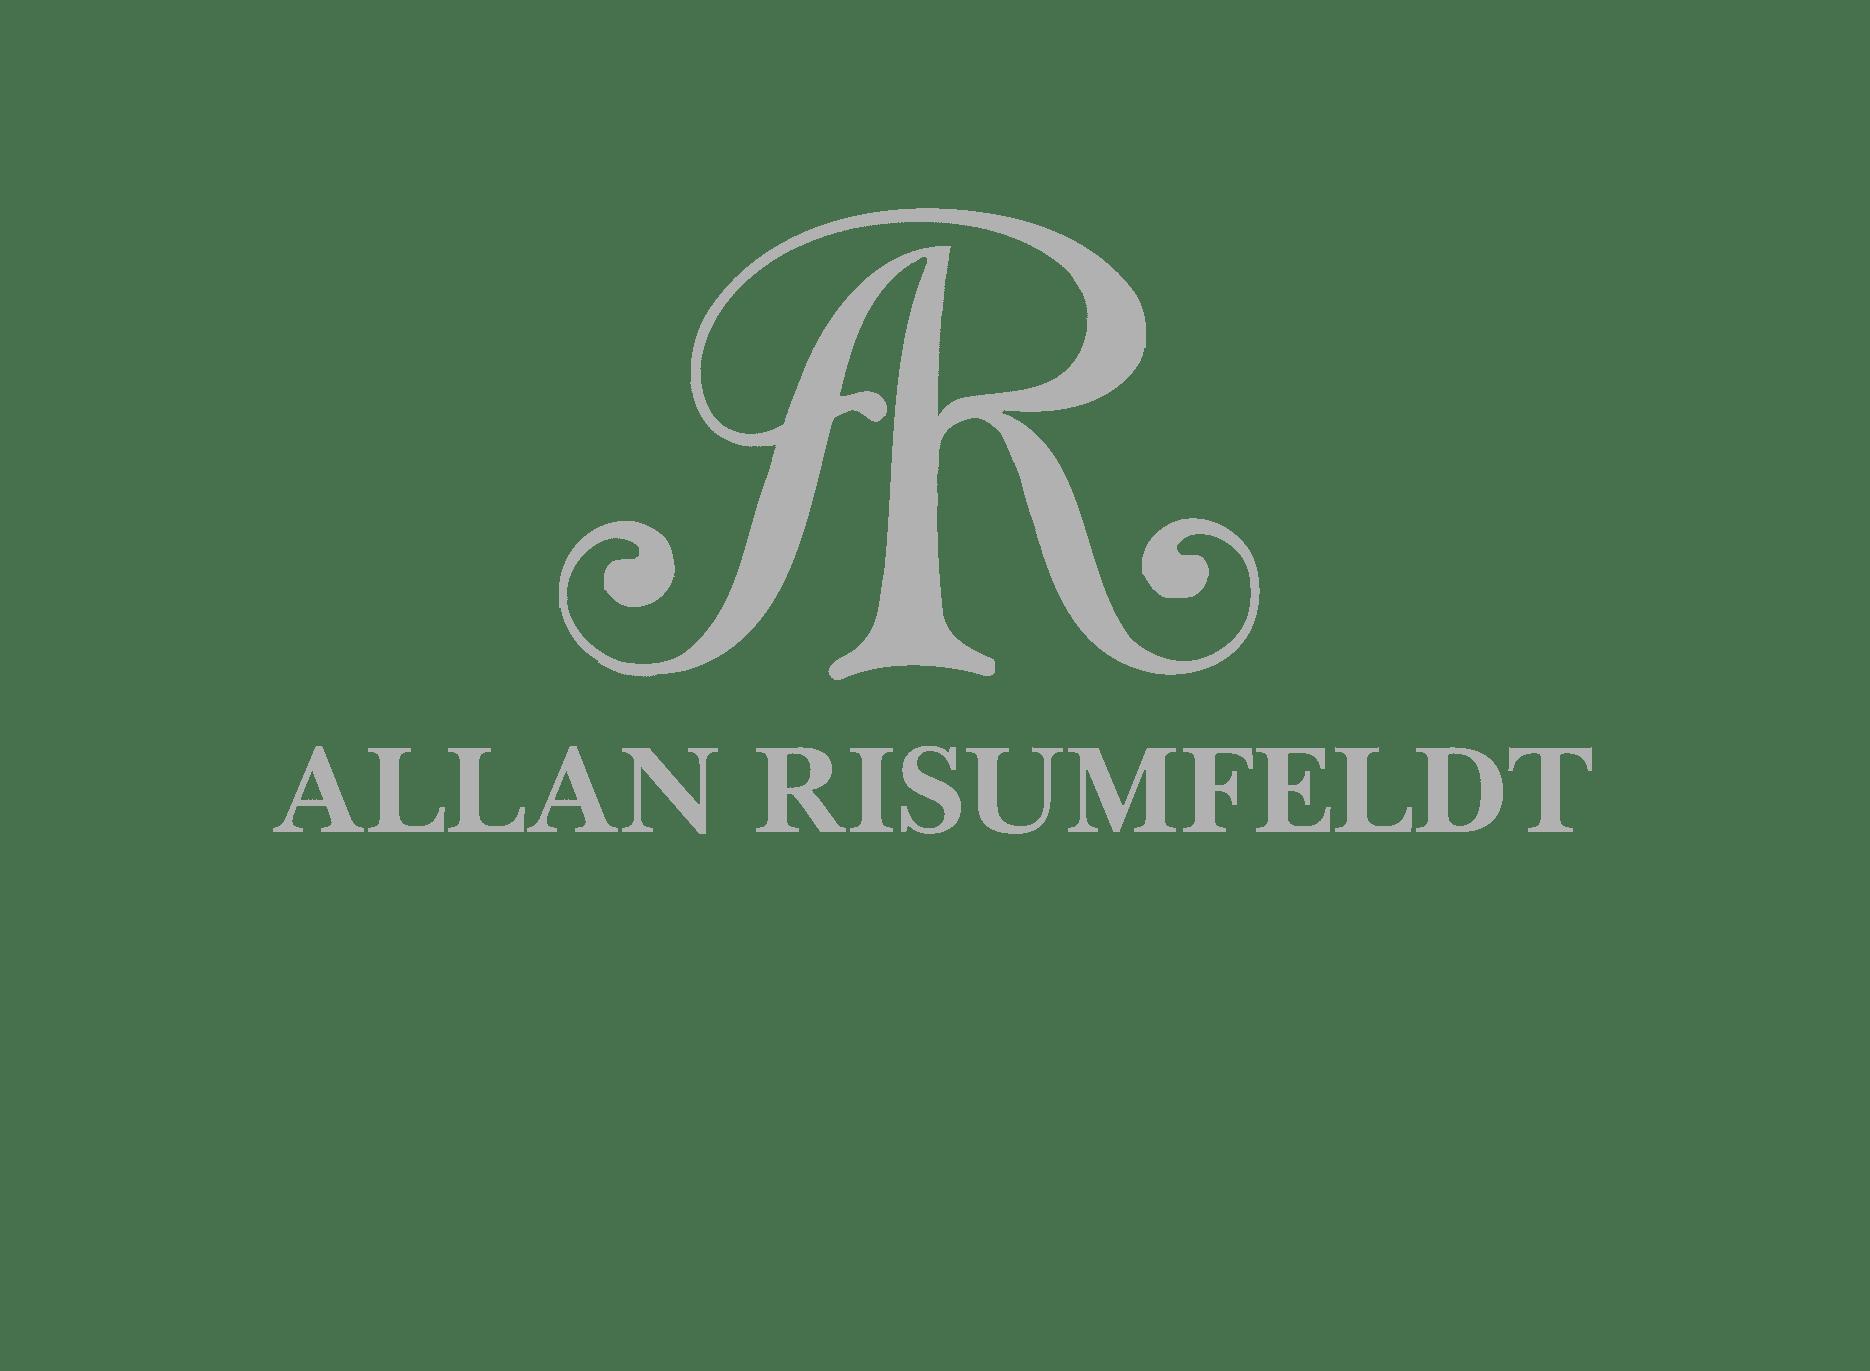 Allan Risumfeldt